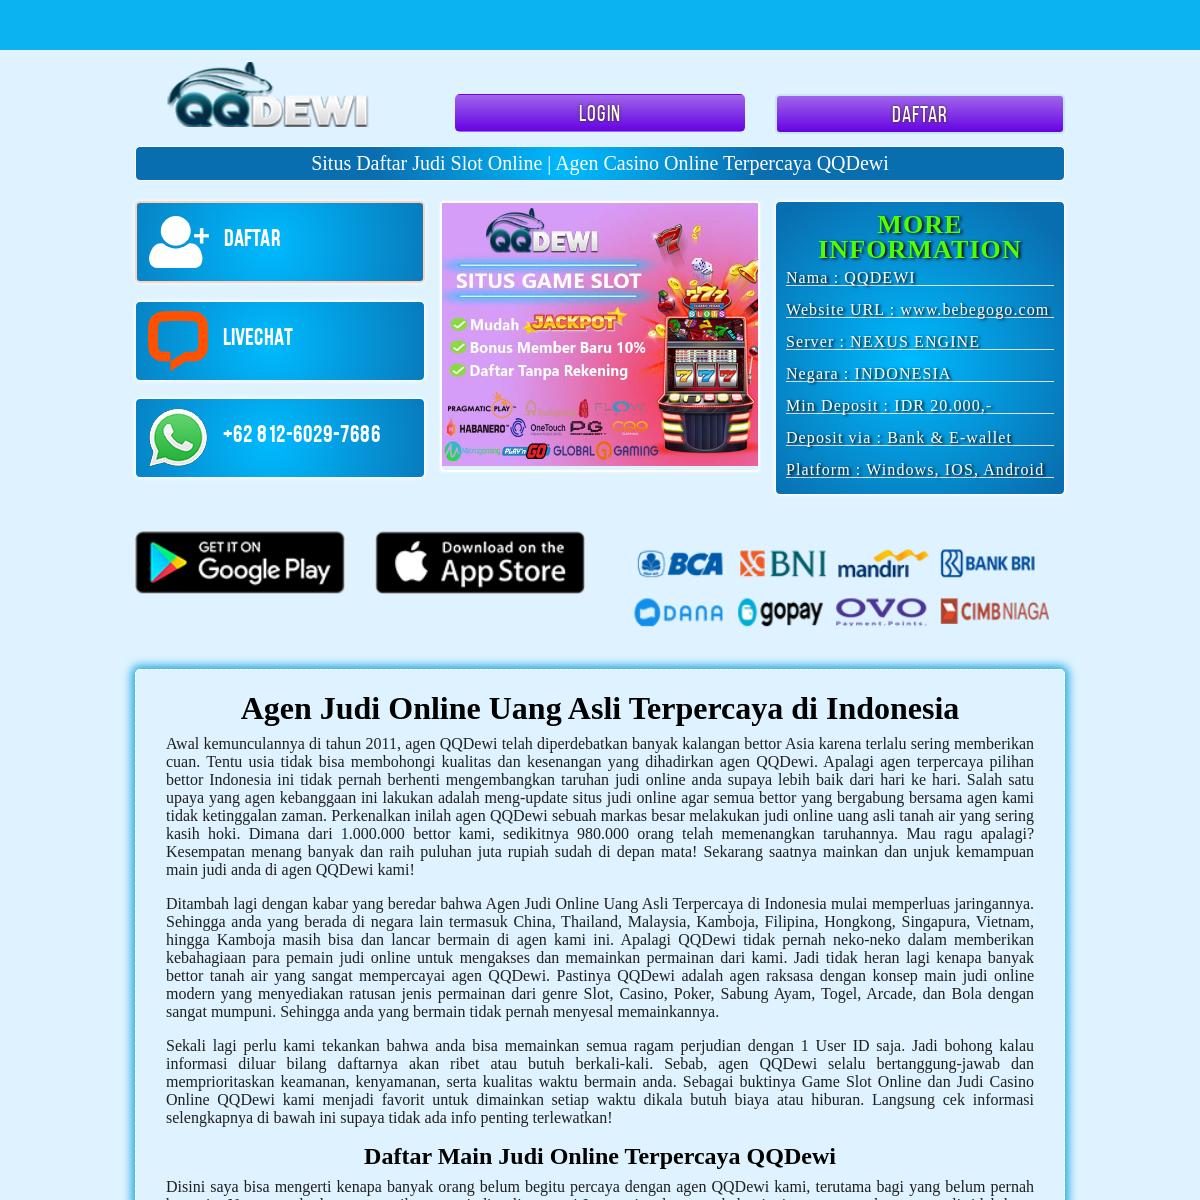 Situs Daftar Judi Slot Online - Agen Casino Online Terpercaya QQDewi